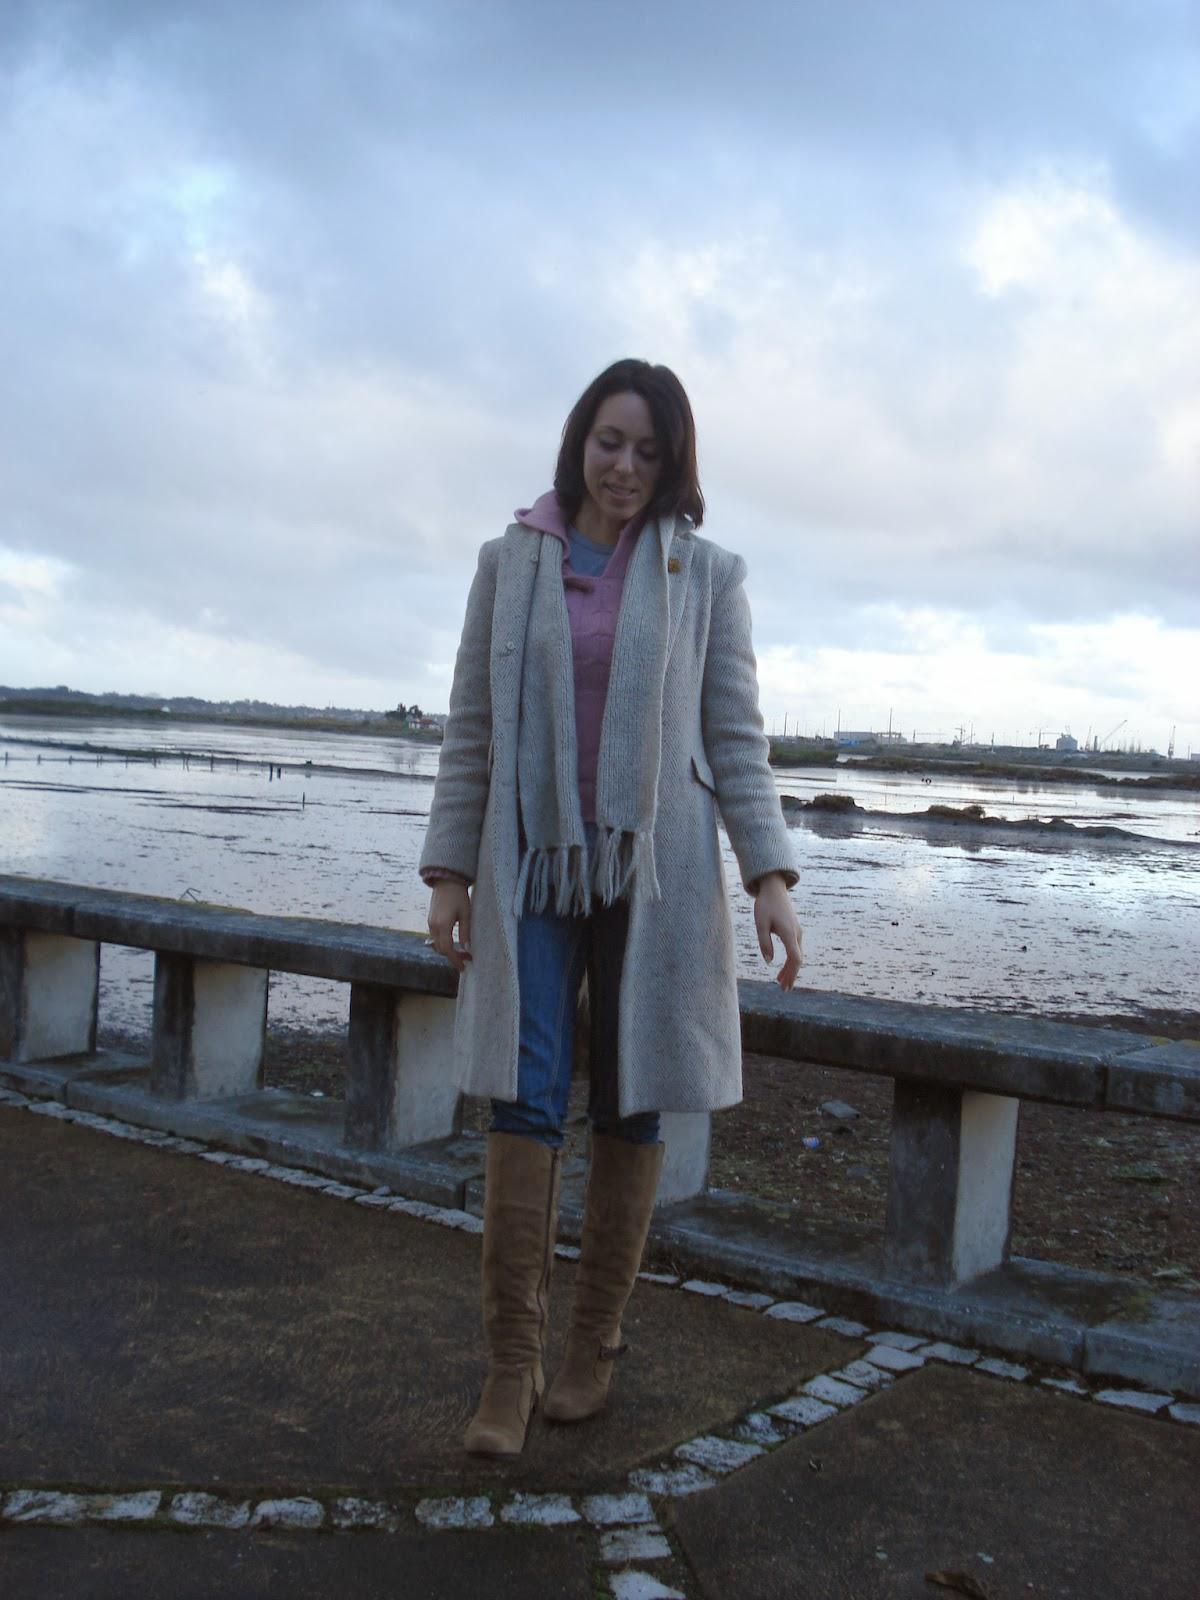 sapatinho, moda, blog, blogue, blogger, top, 10, aveiro, portugal, look